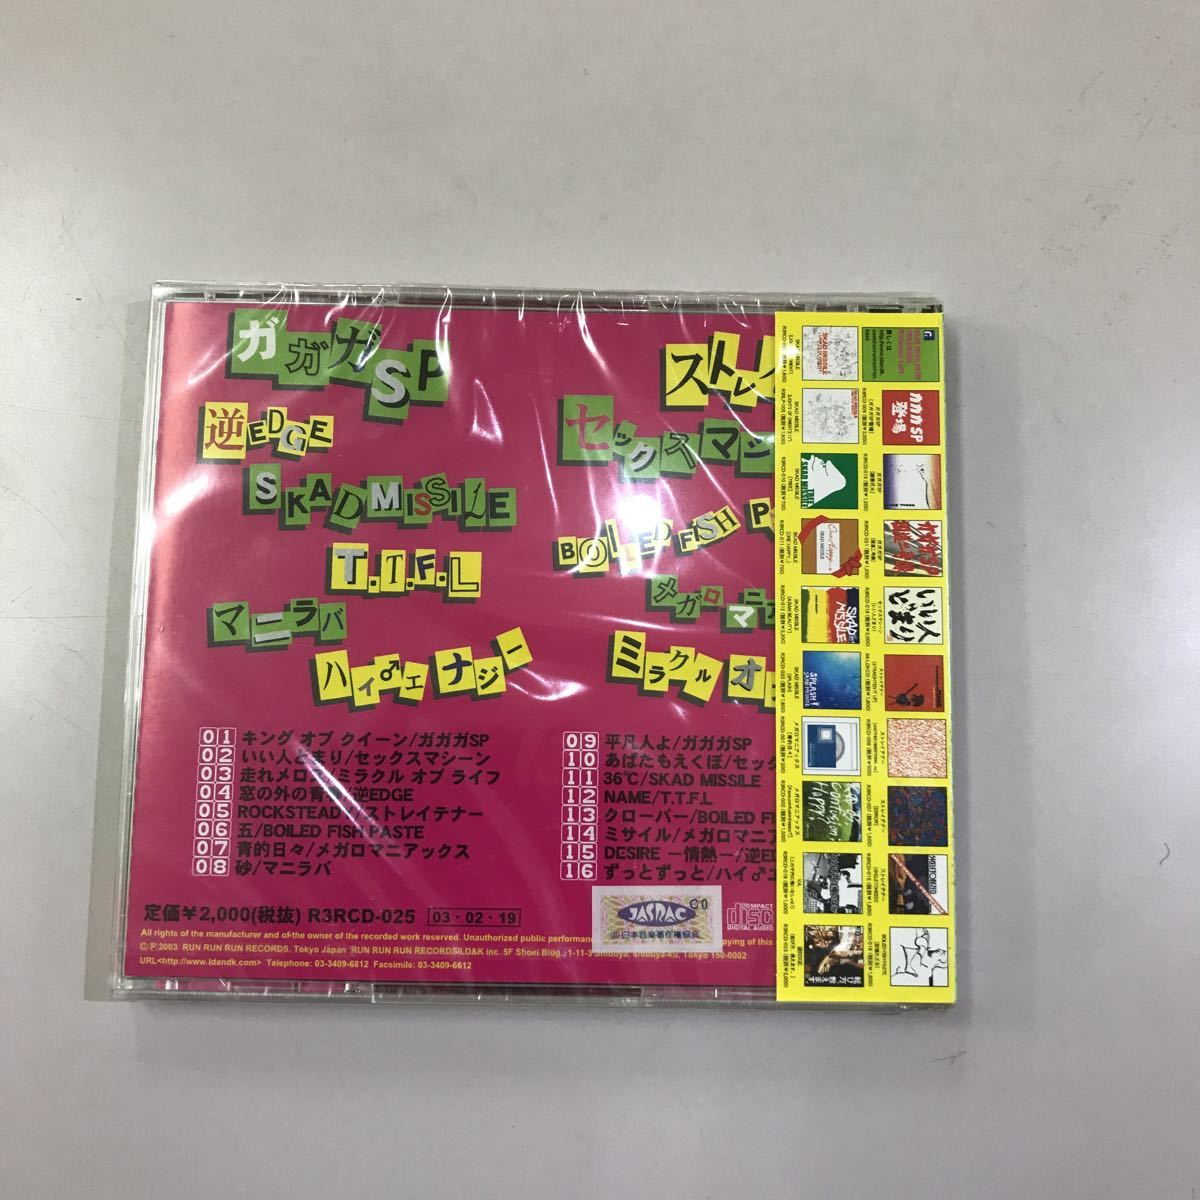 CD 未開封 長期保存品【邦楽】ザ ストーリー オブ ラン ラン ラン レコーズ ボリューム